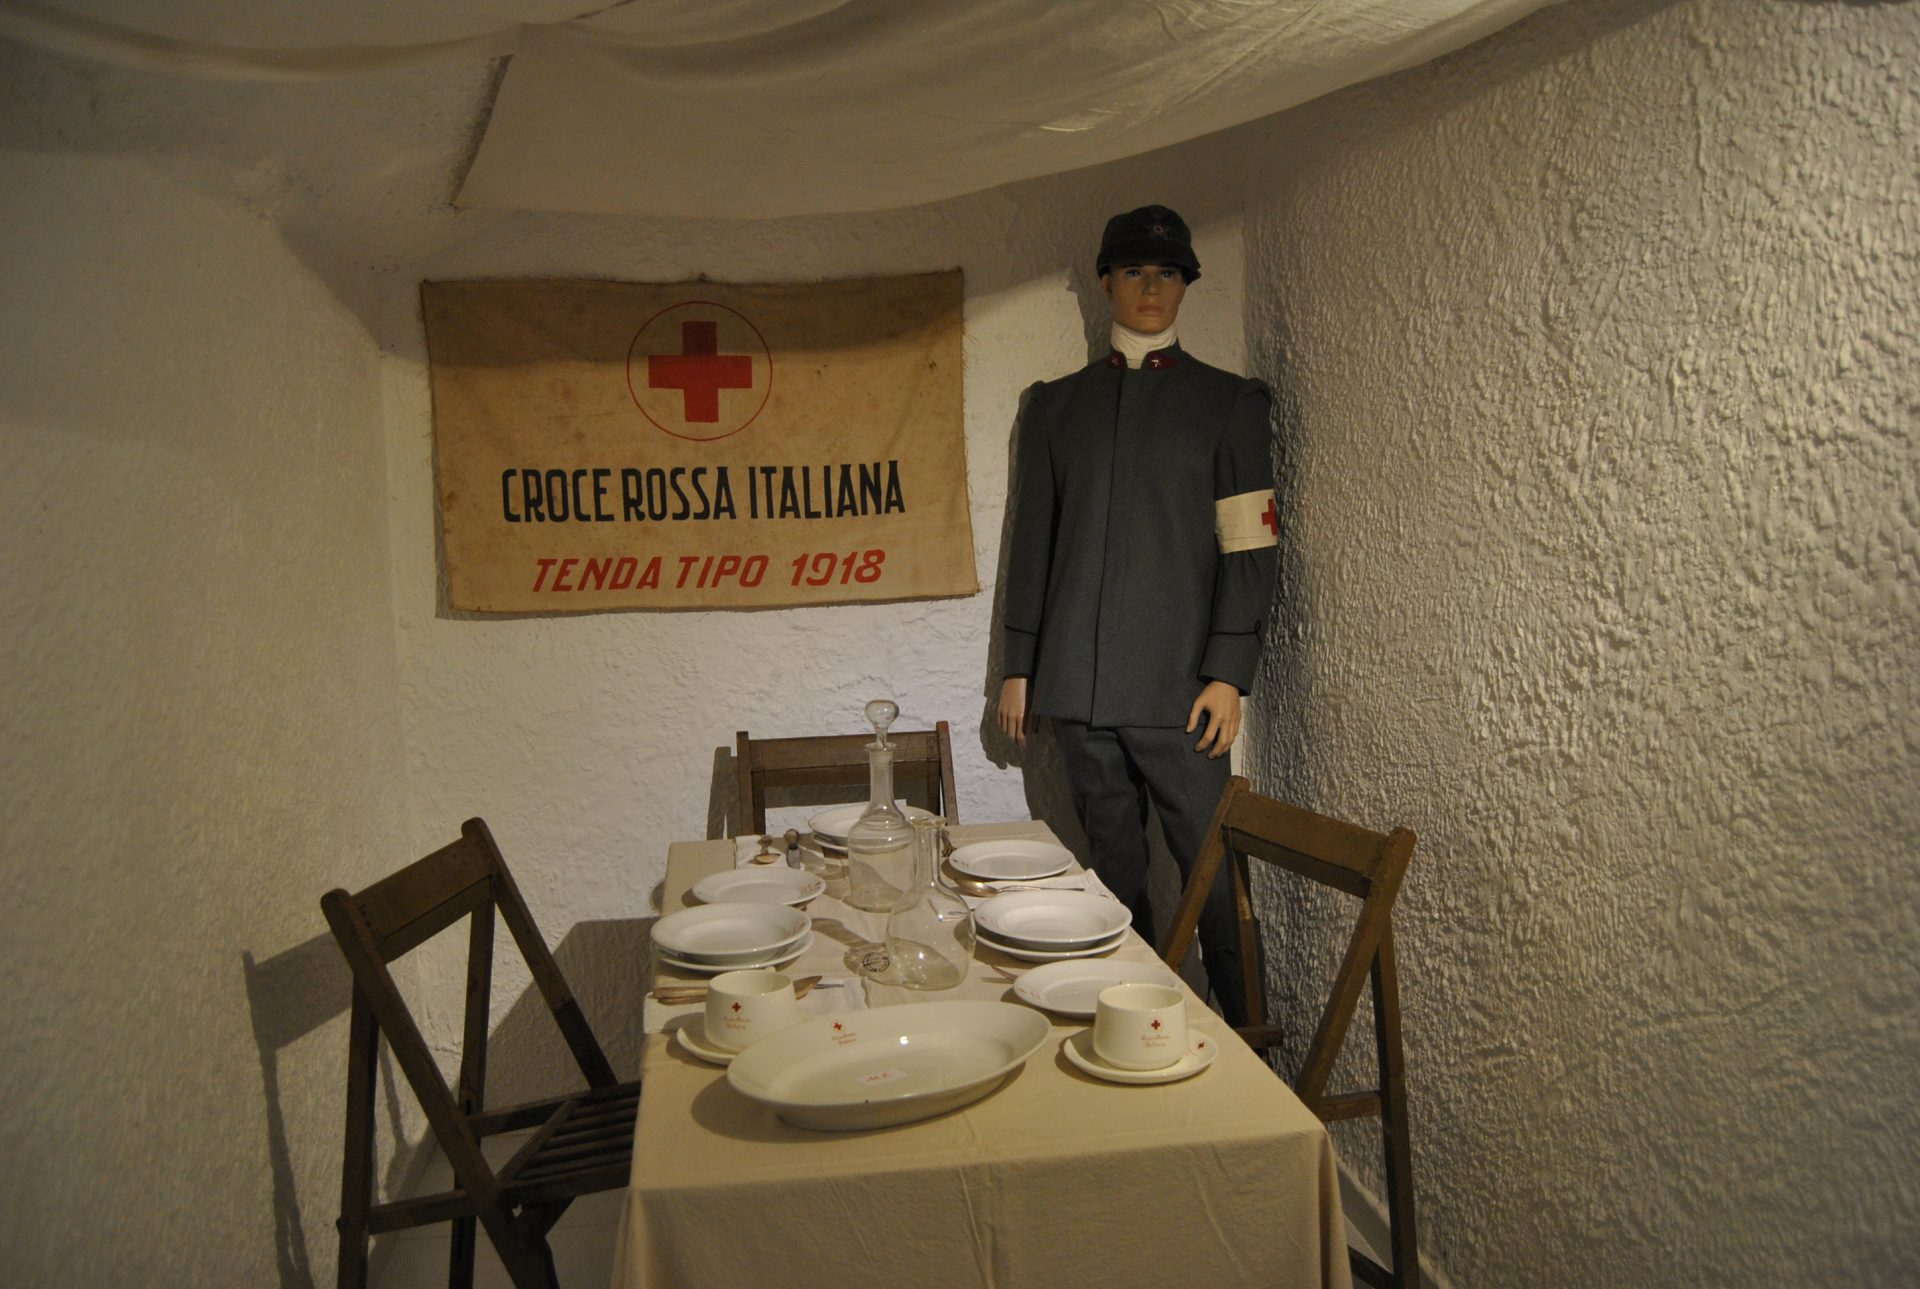 museo arti sanitarie incurabili croce rossa